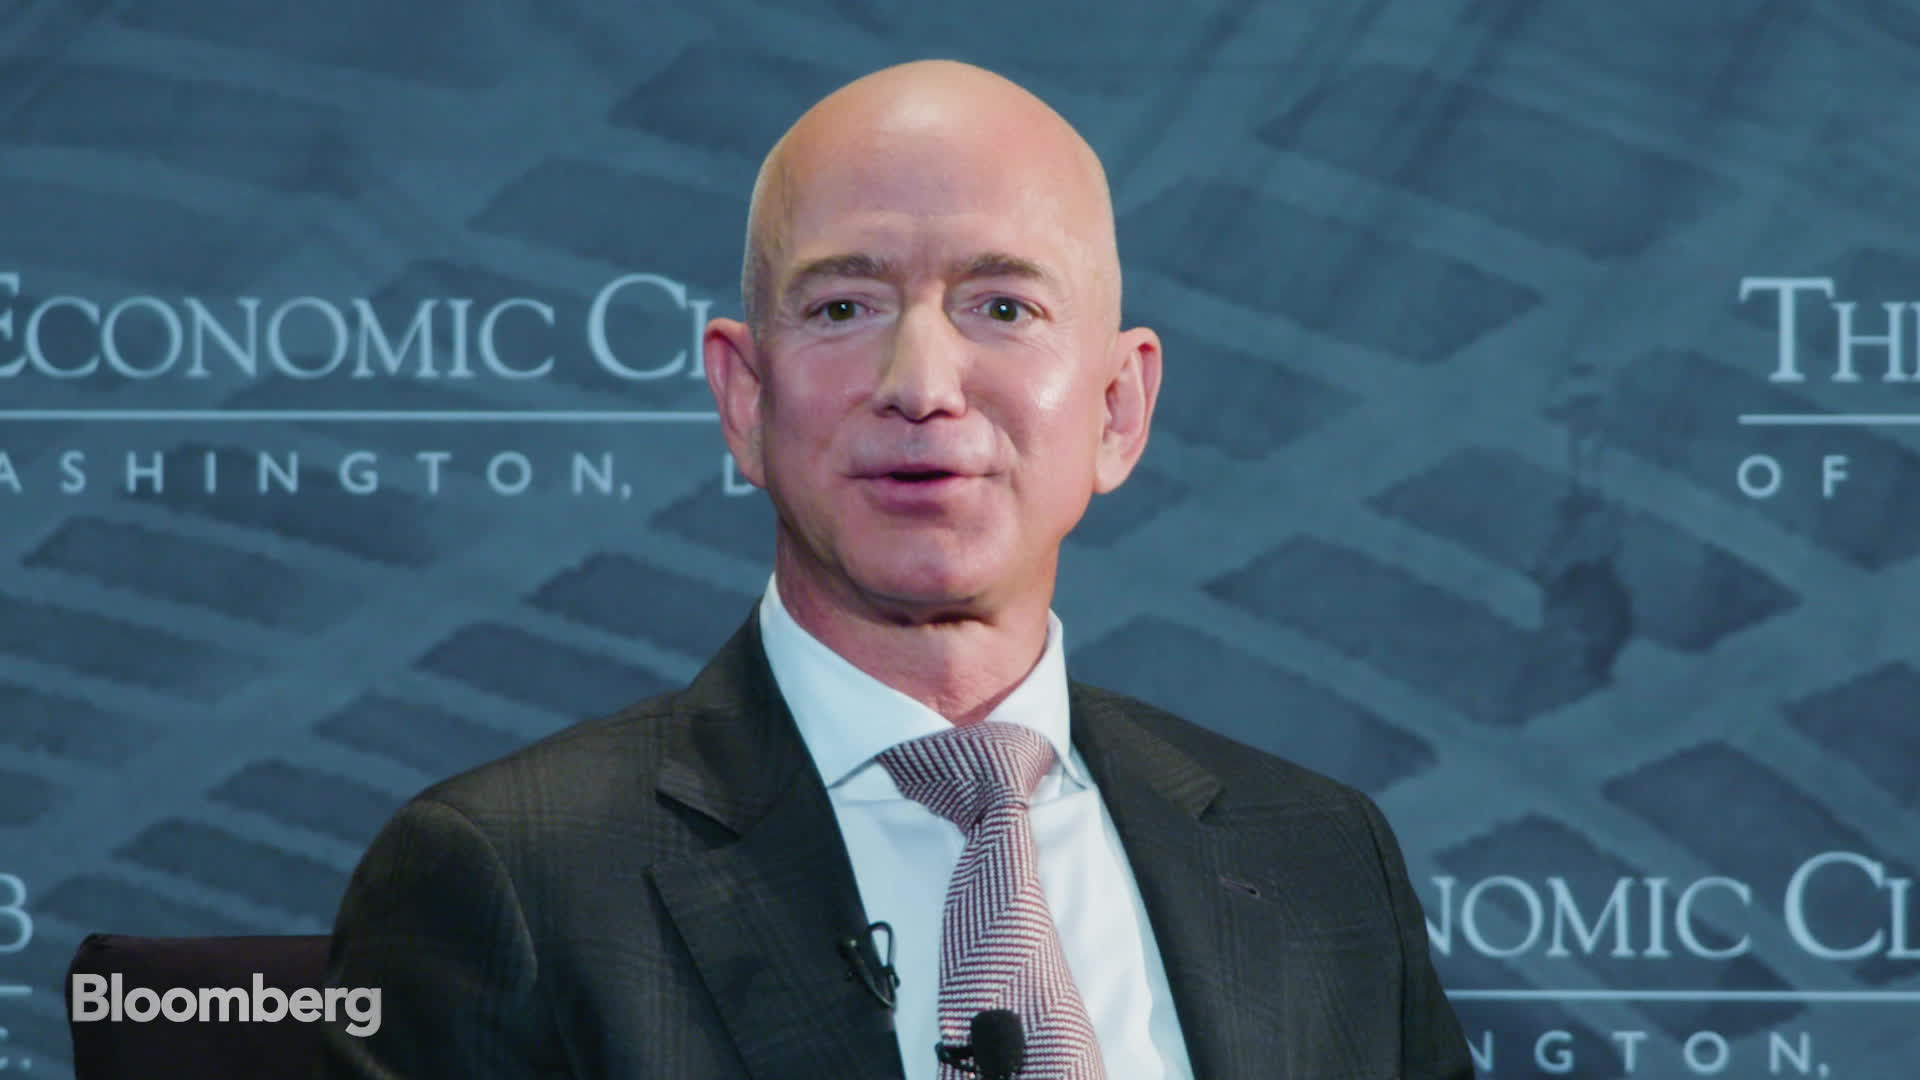 The David Rubenstein Show Jeff Bezos Bloomberg